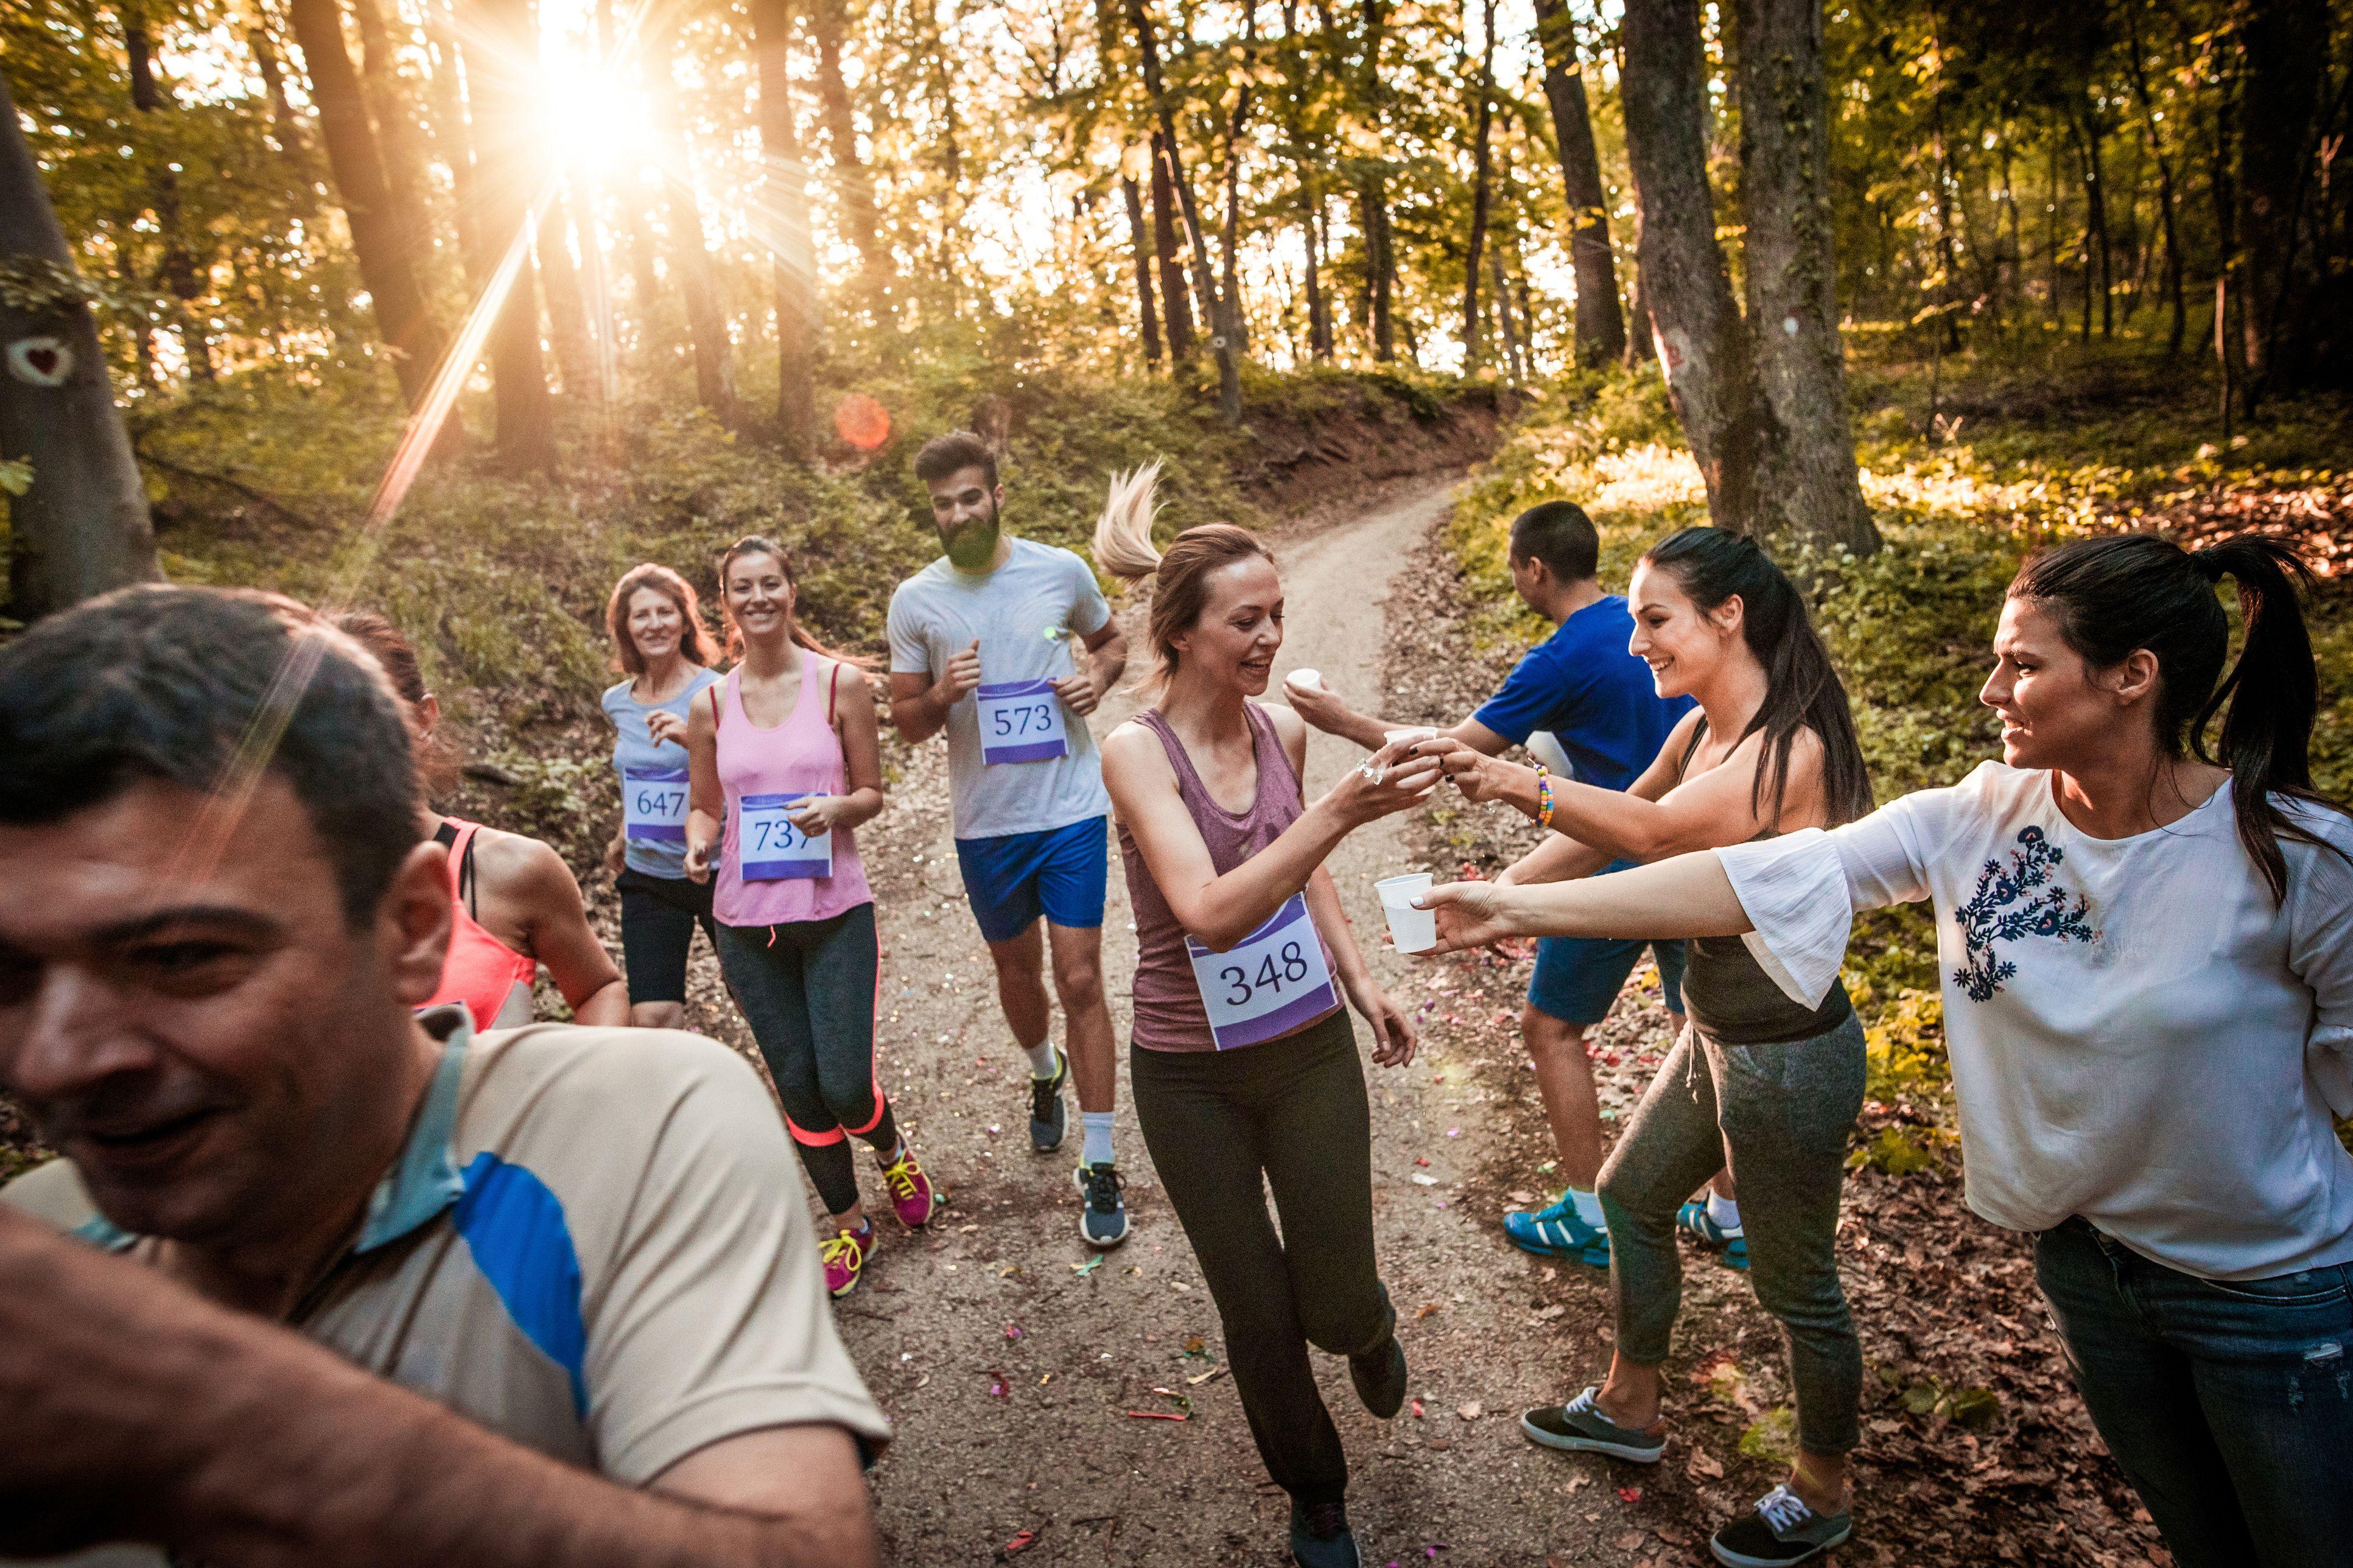 11 Most Scenic Half Marathons in the U.S.